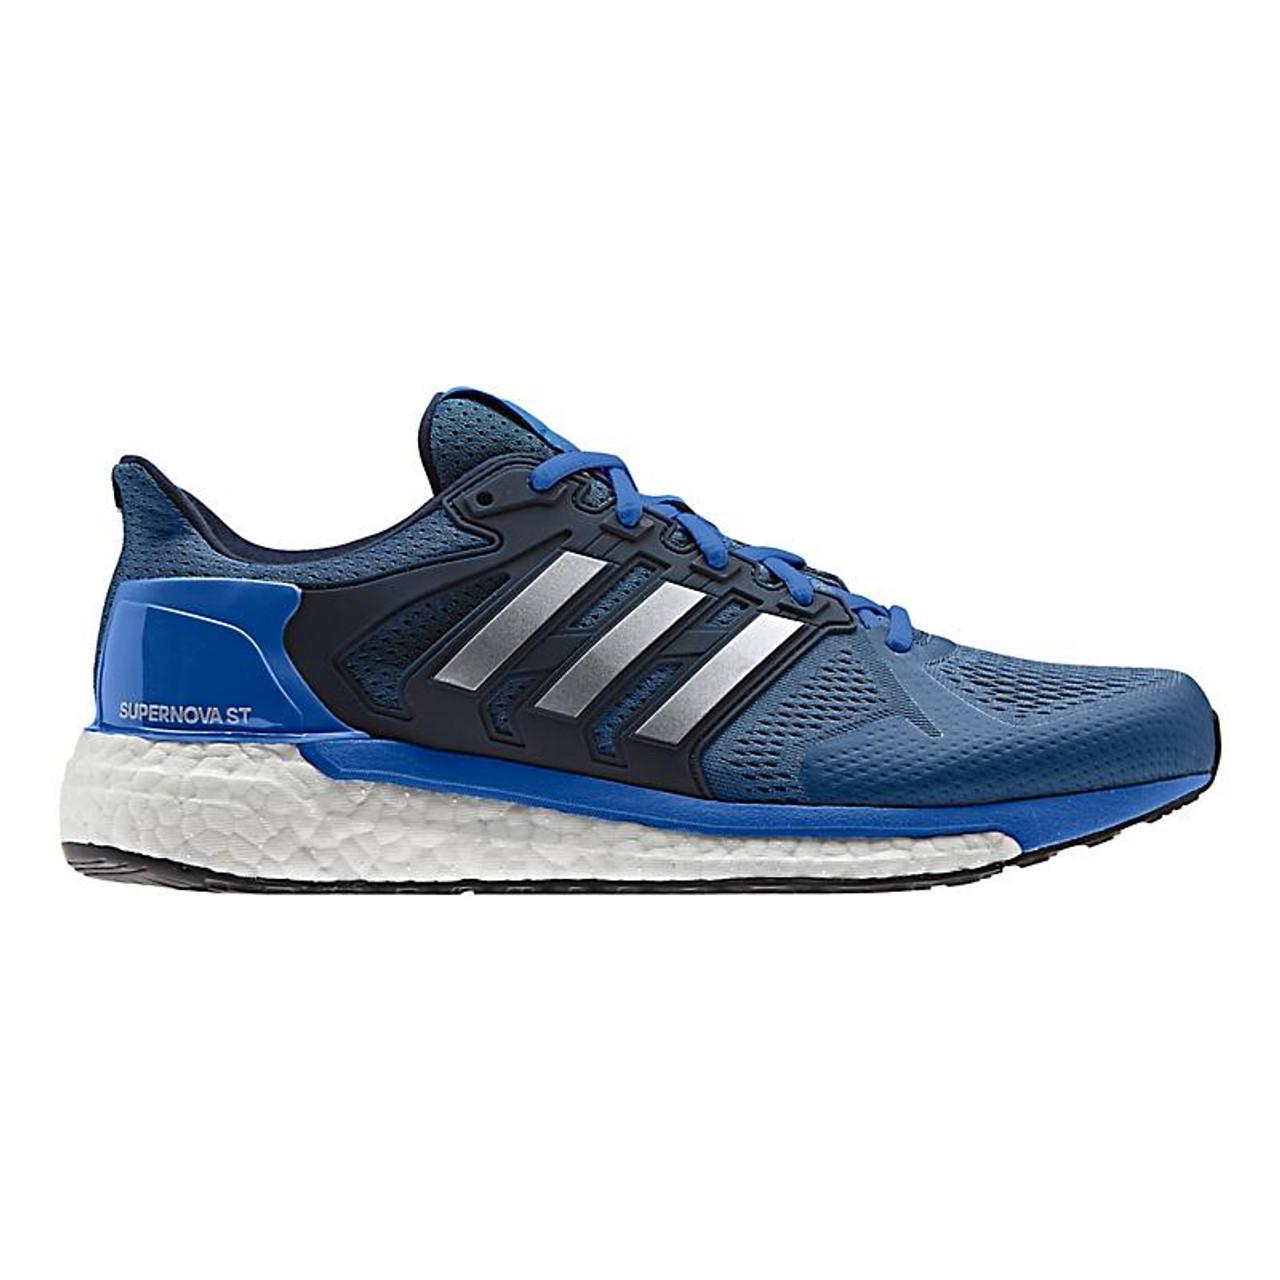 8c65ff41eb66c Men s adidas Supernova ST Running Shoe